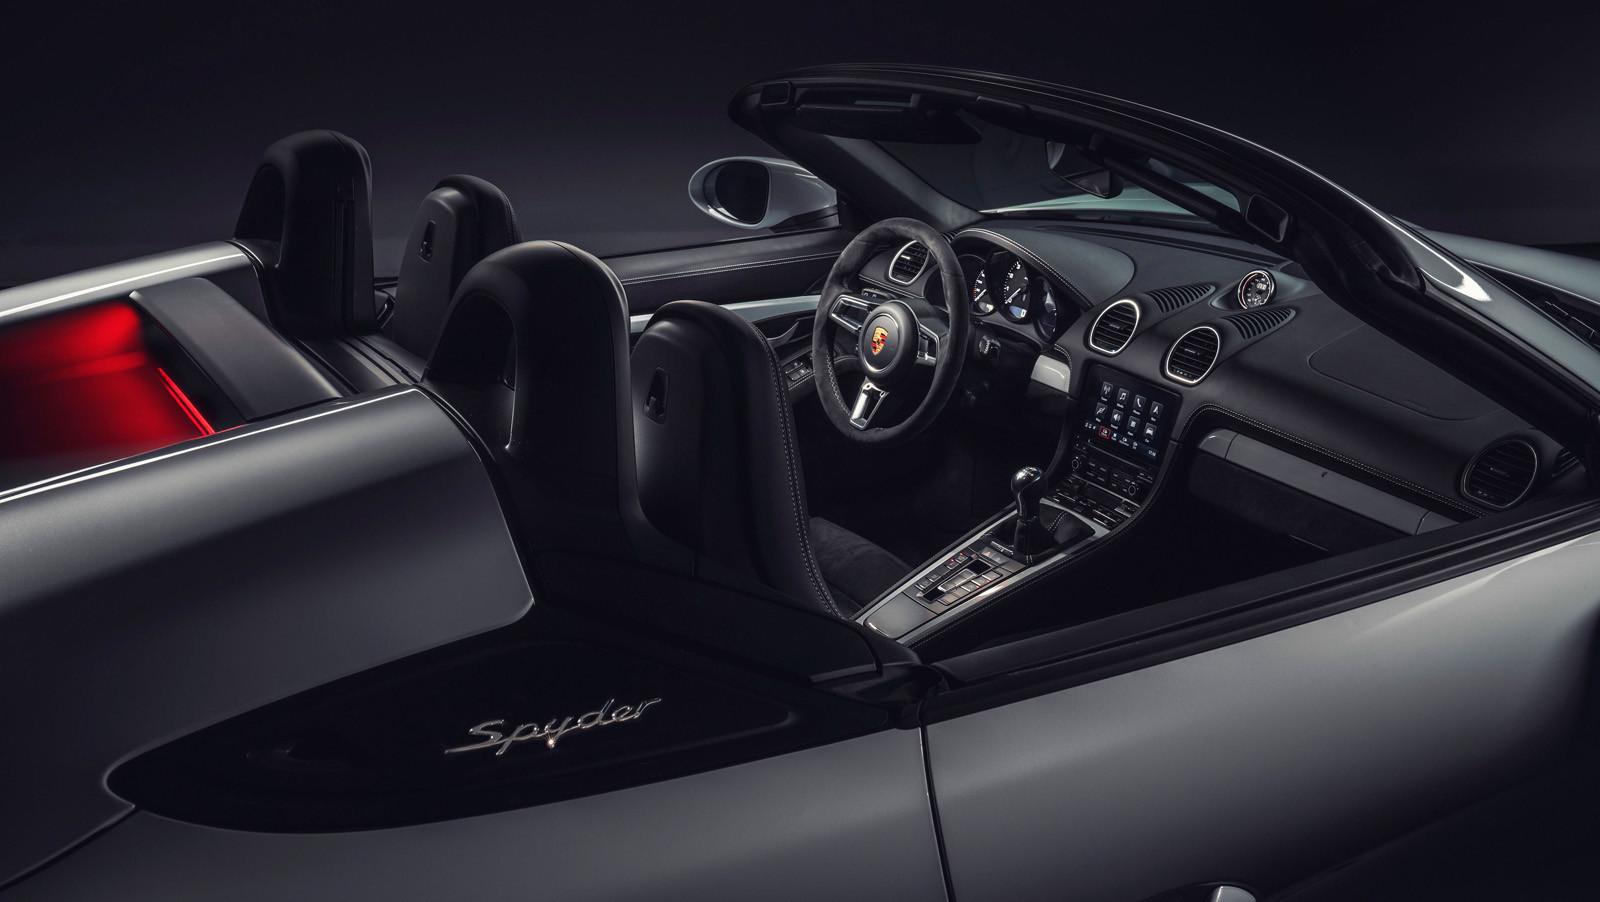 Foto de Porsche 718 Cayman GT4 y Porsche 718 Spyder (14/16)